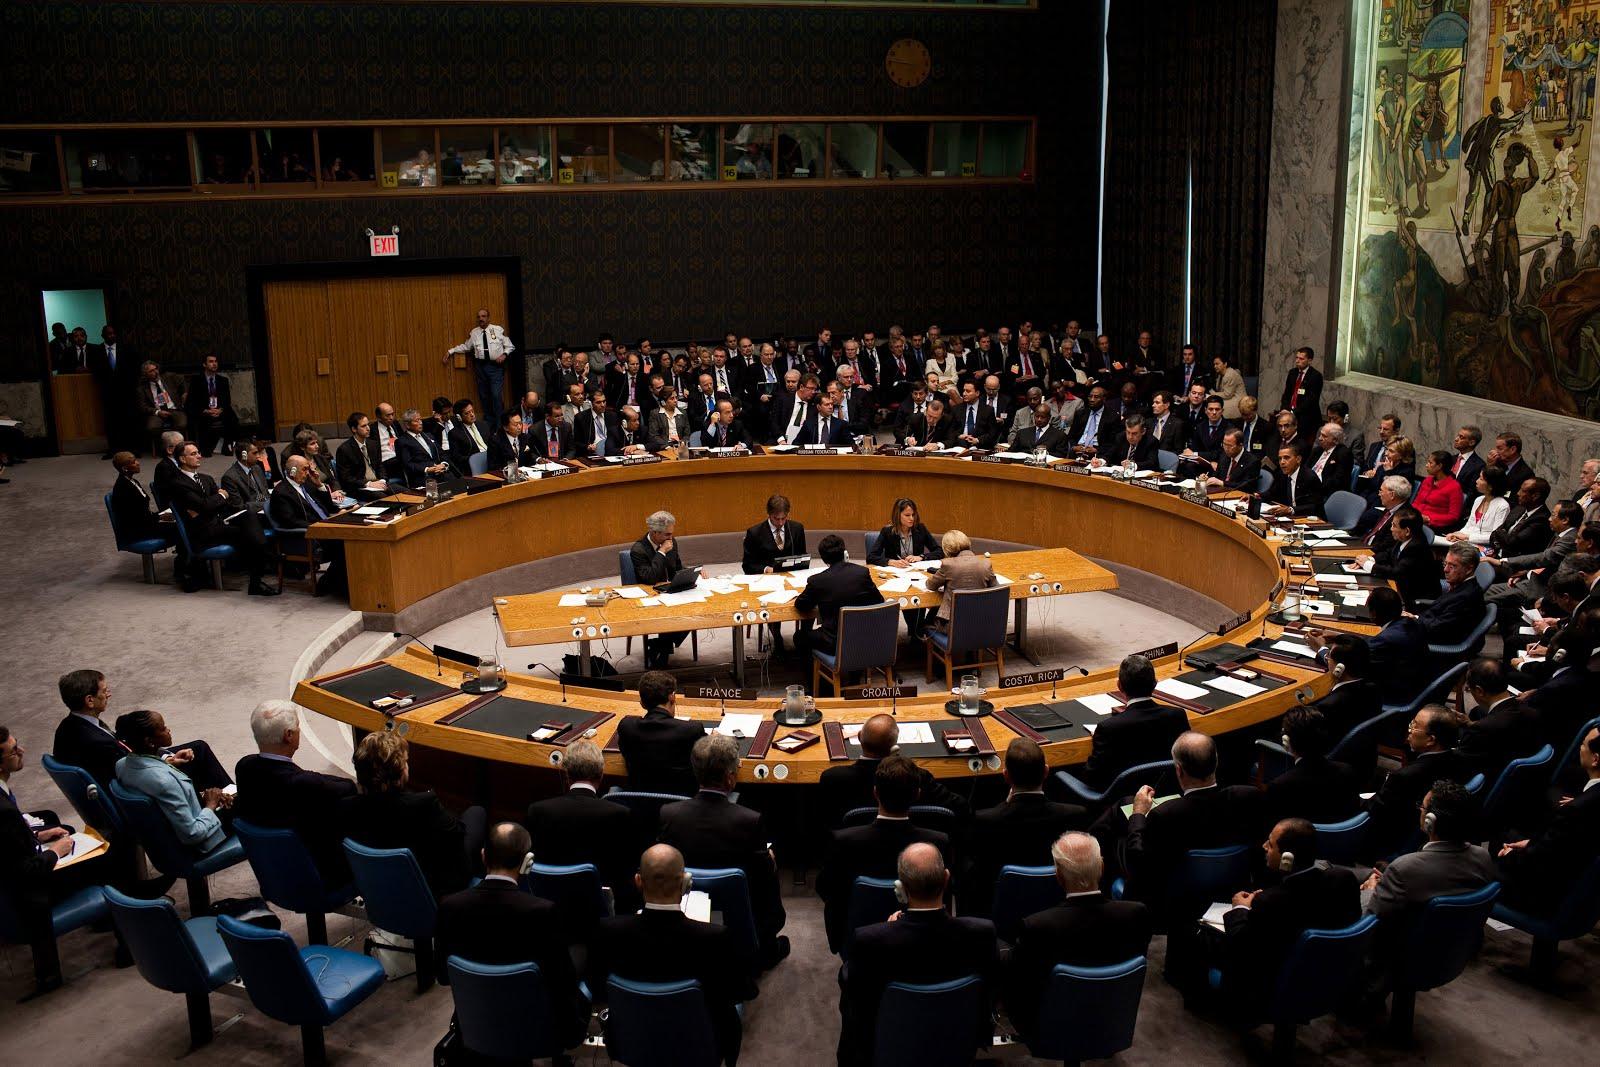 https://4.bp.blogspot.com/-F9kaWRffcBw/WXLw2pc1KEI/AAAAAAAAYro/m-EiSScAsrA2VdUlv1TQtdSjGOyl7s9DgCK4BGAYYCw/s1600/Barack_Obama_chairs_a_United_Nations_Security_Council_meeting.jpg